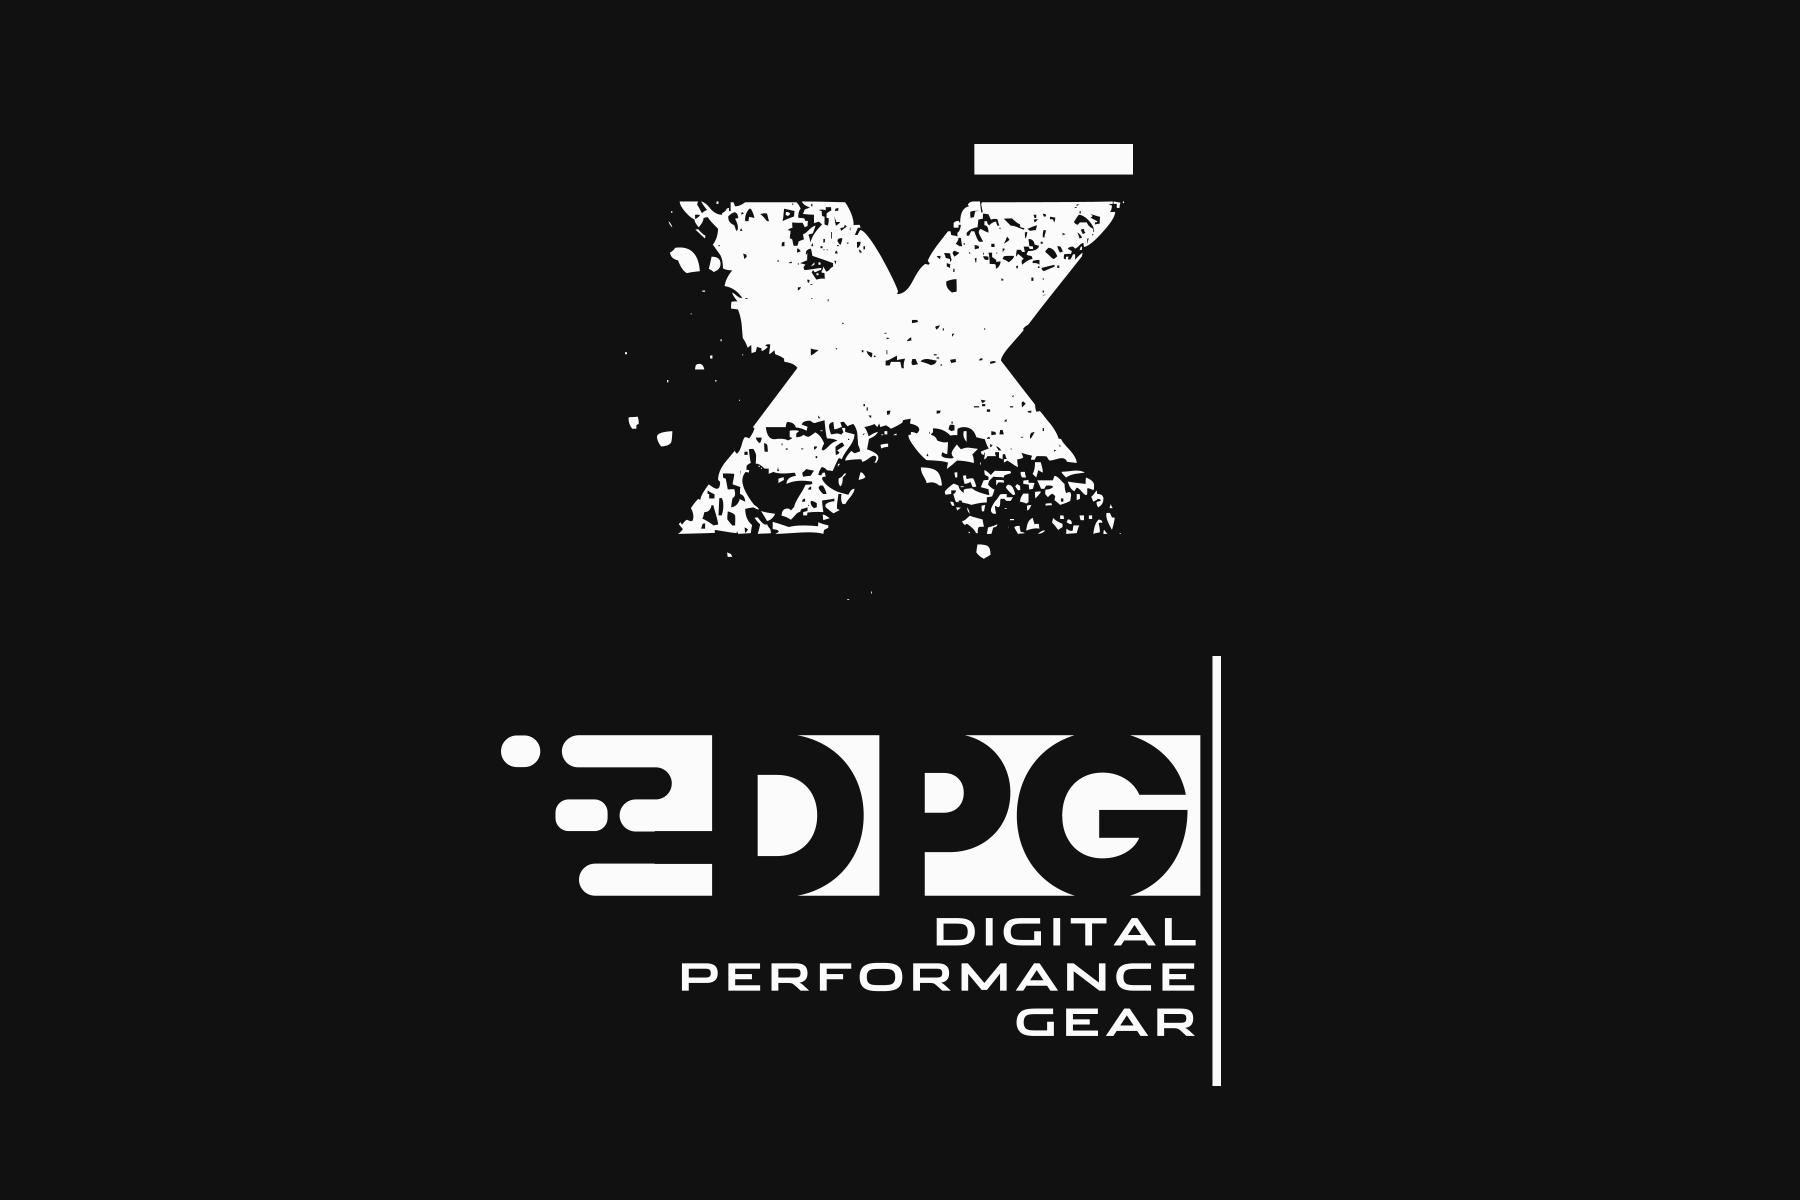 x dpg.png